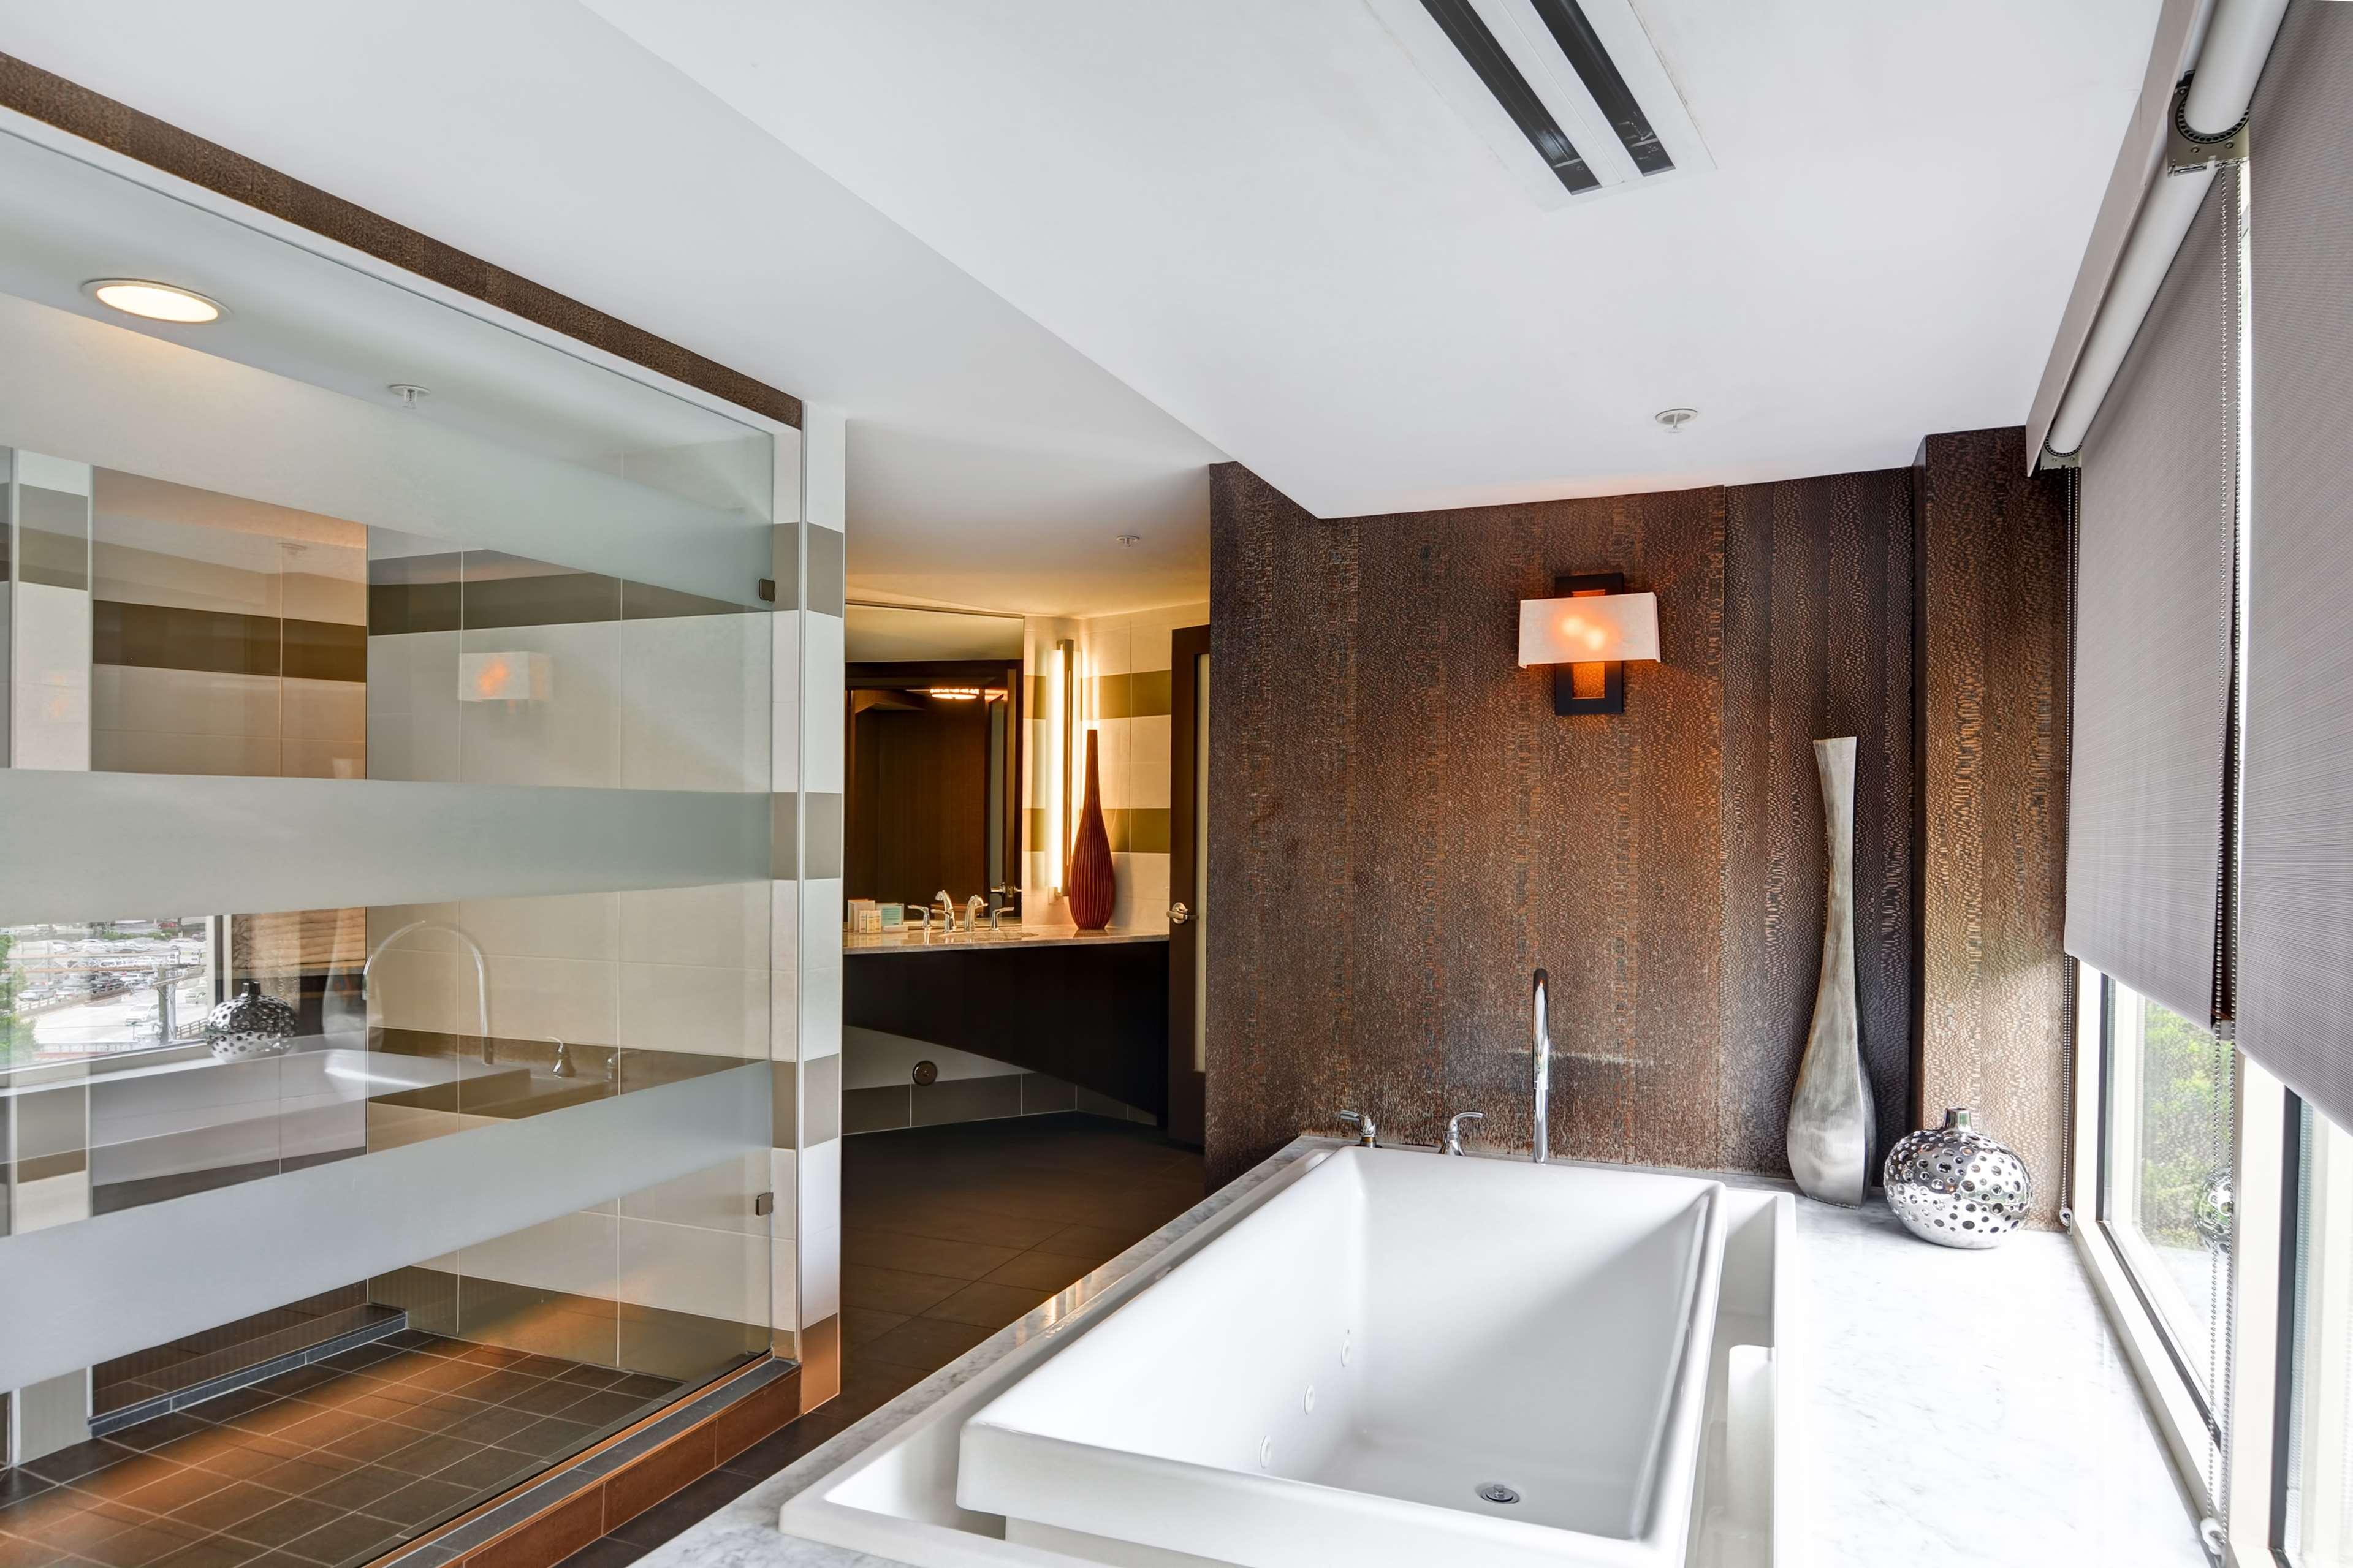 Hampton Inn & Suites Raleigh/Crabtree Valley image 27